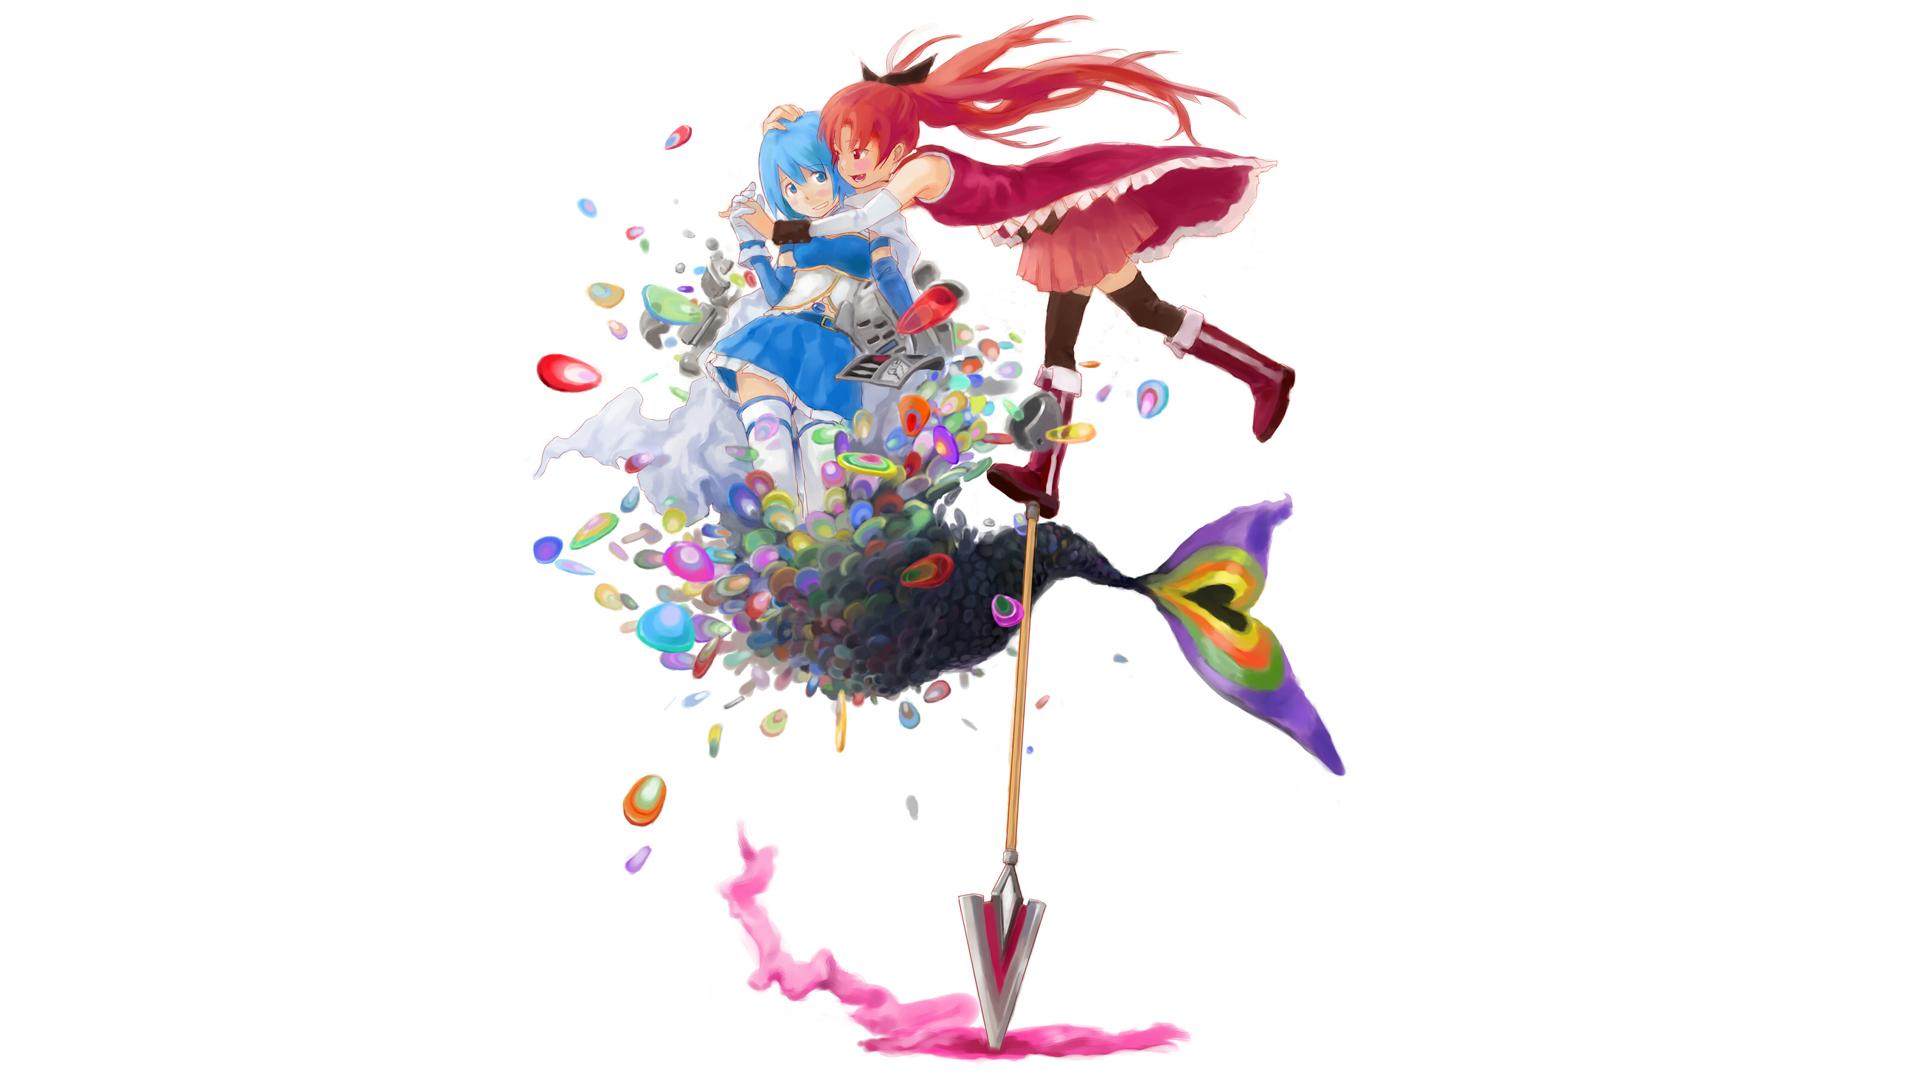 Google anime wallpapers wallpapersafari - Google anime wallpaper ...